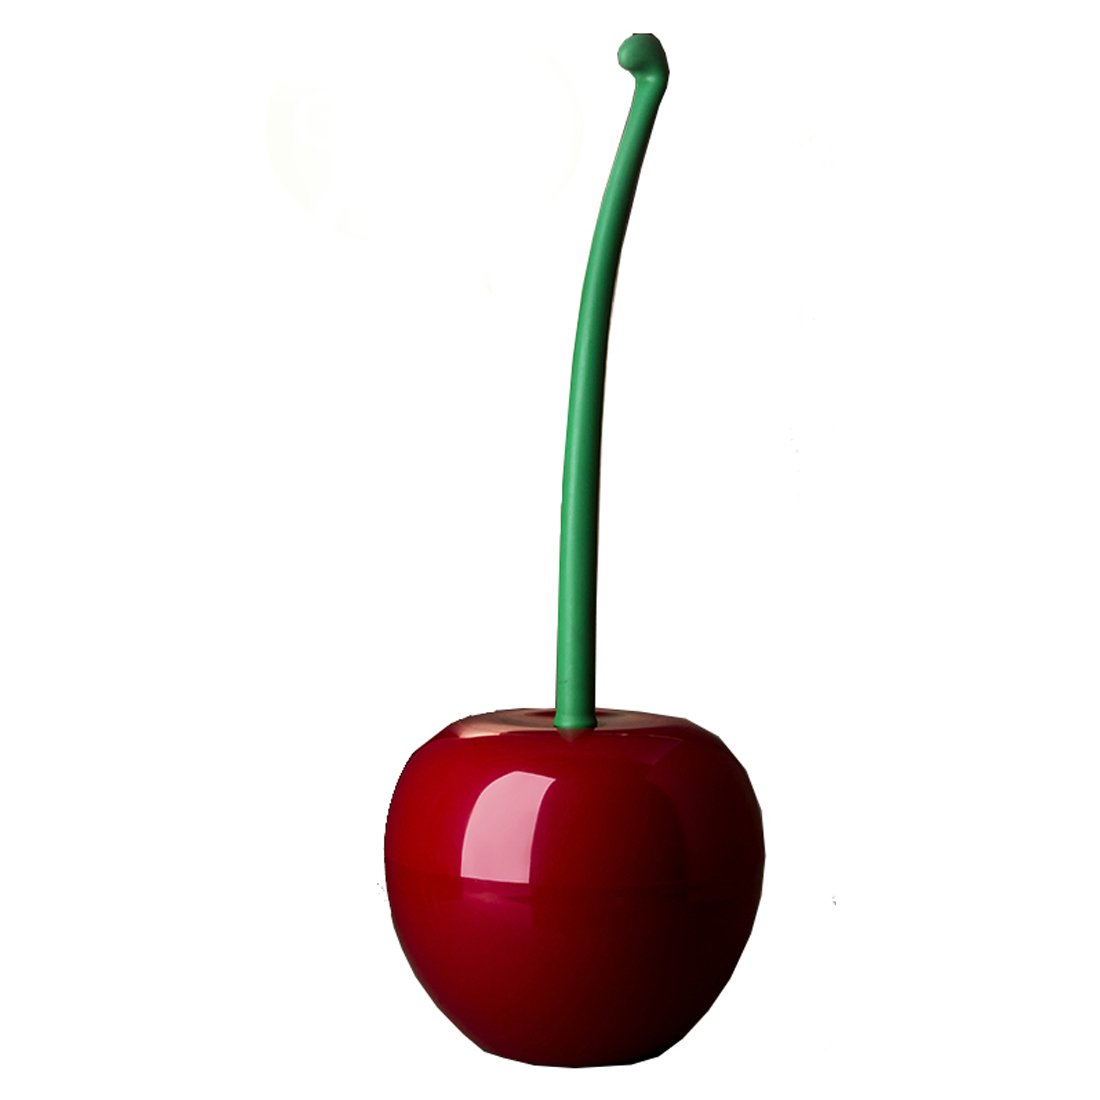 Cherry soporte para cepillo inodoro cepillo escobilla de baño con soporte para escobilla de baño de plástico Luwu-Store 7002679